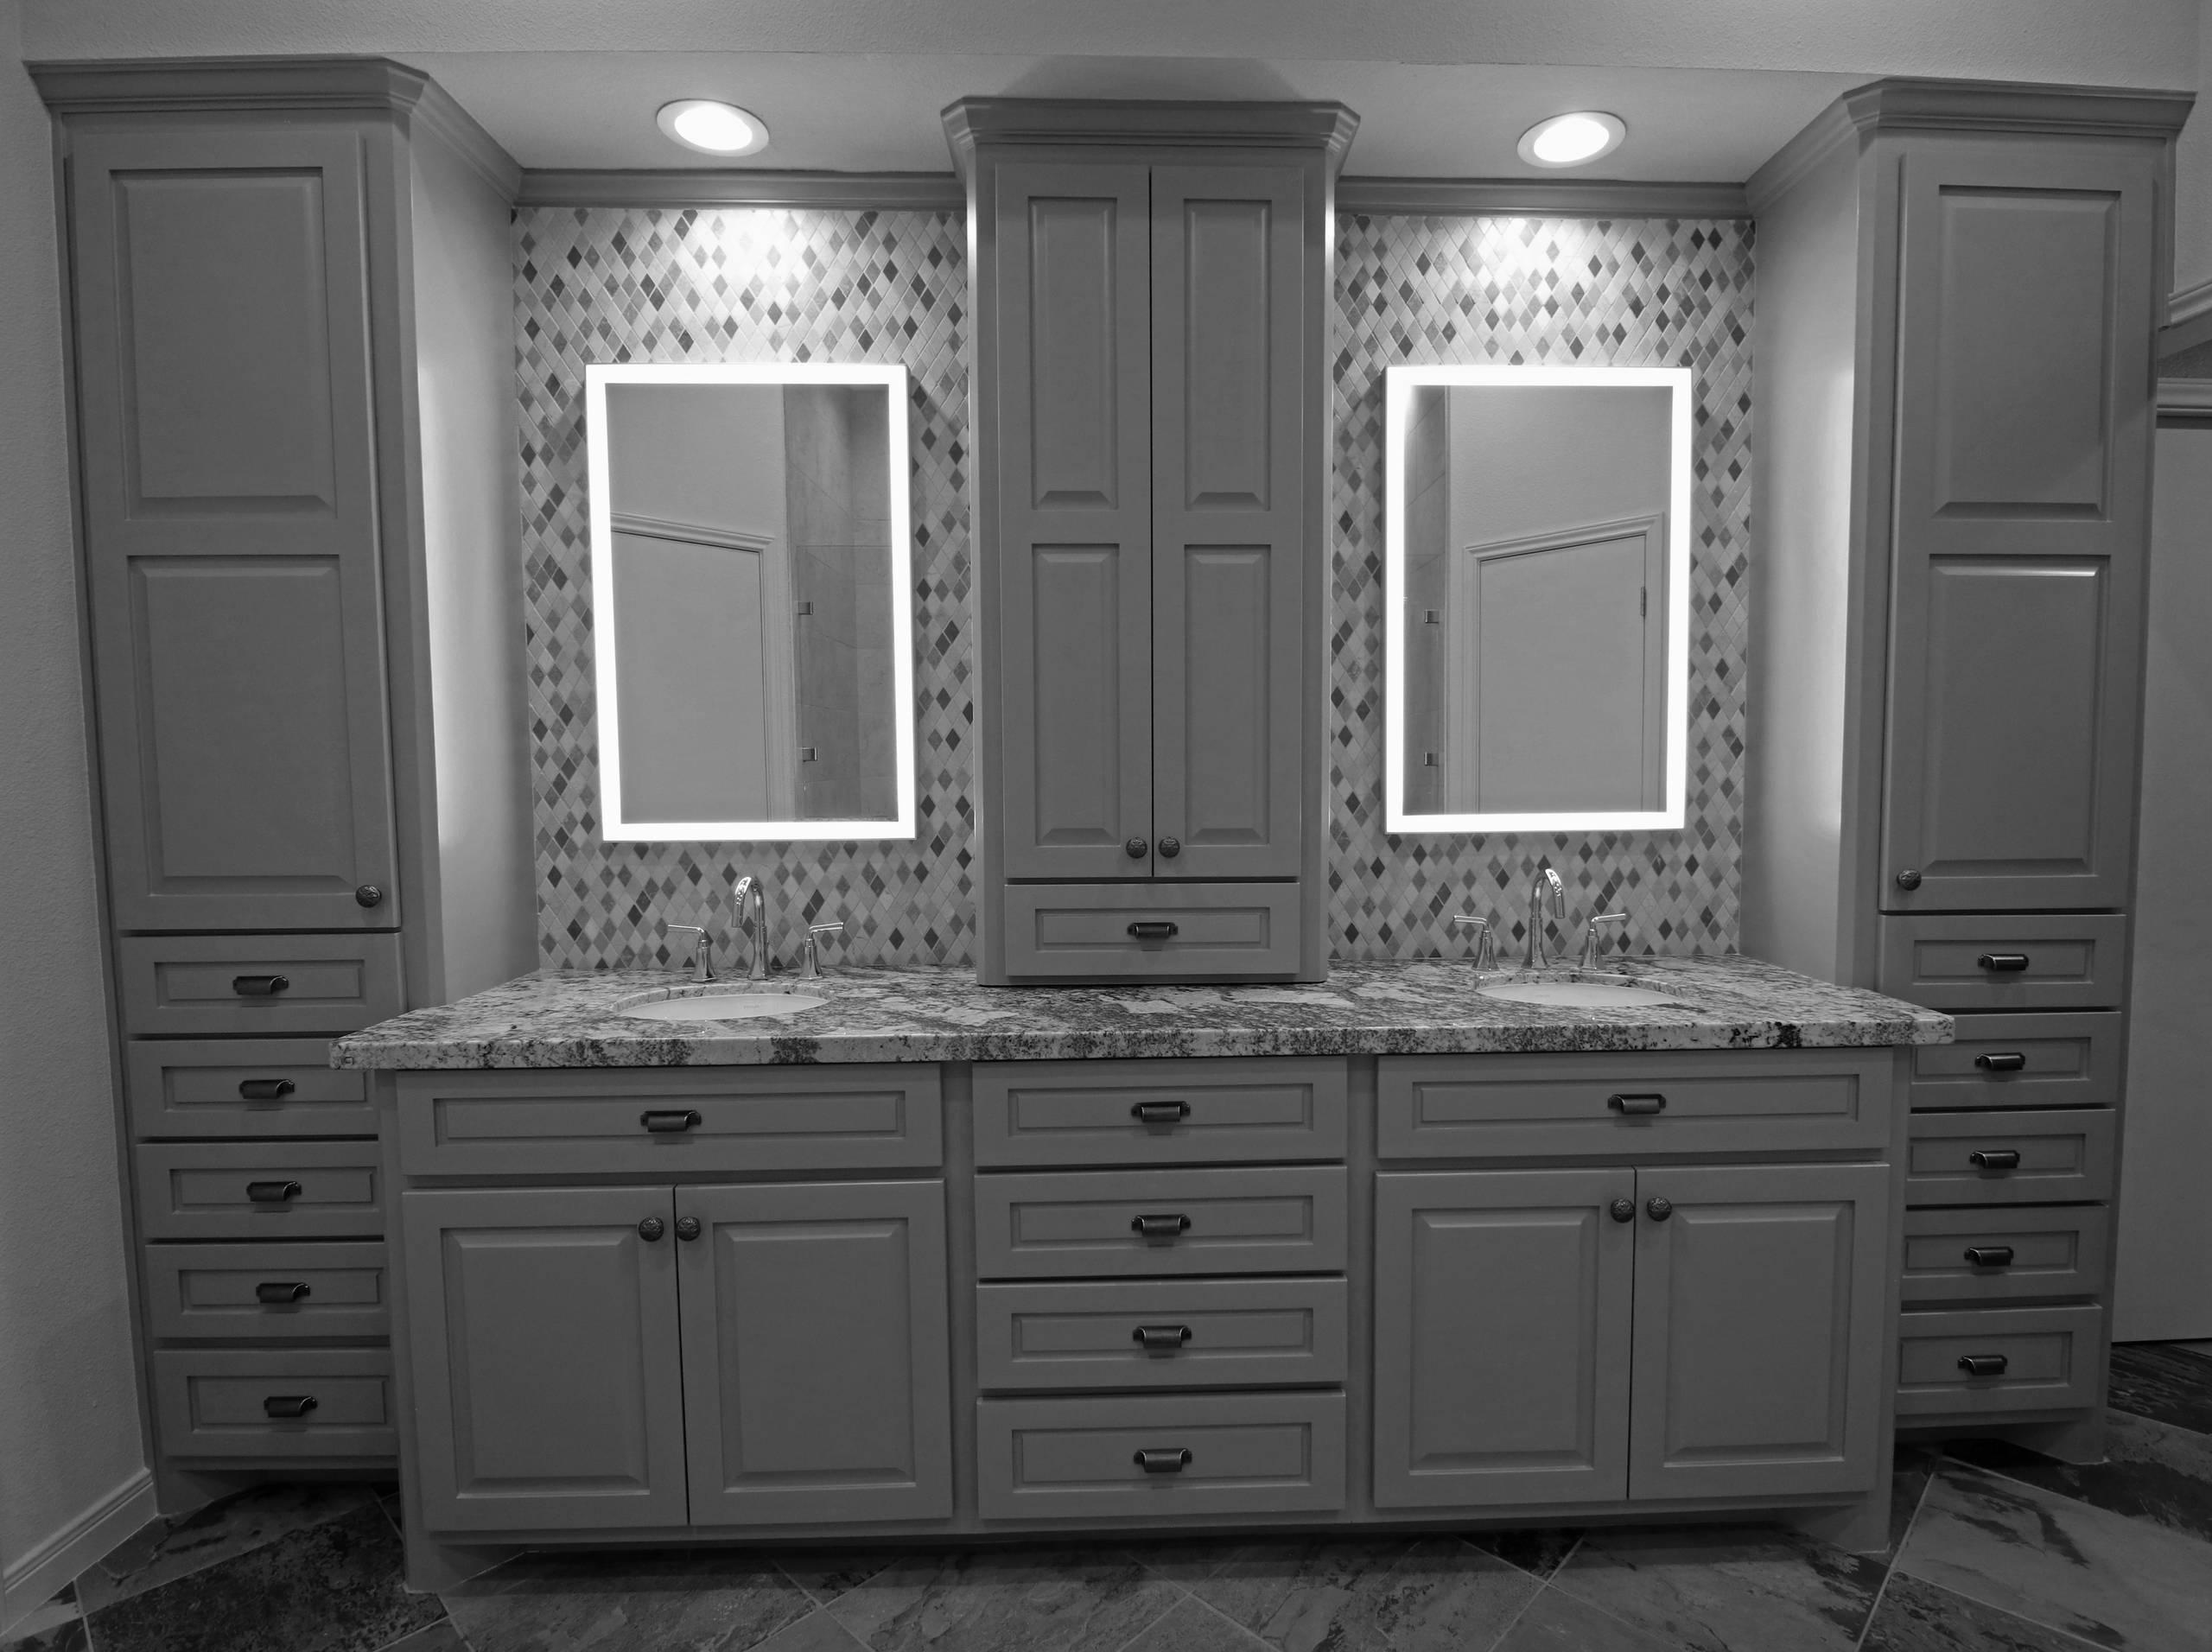 Huckleberry - Master Bathroom Suite